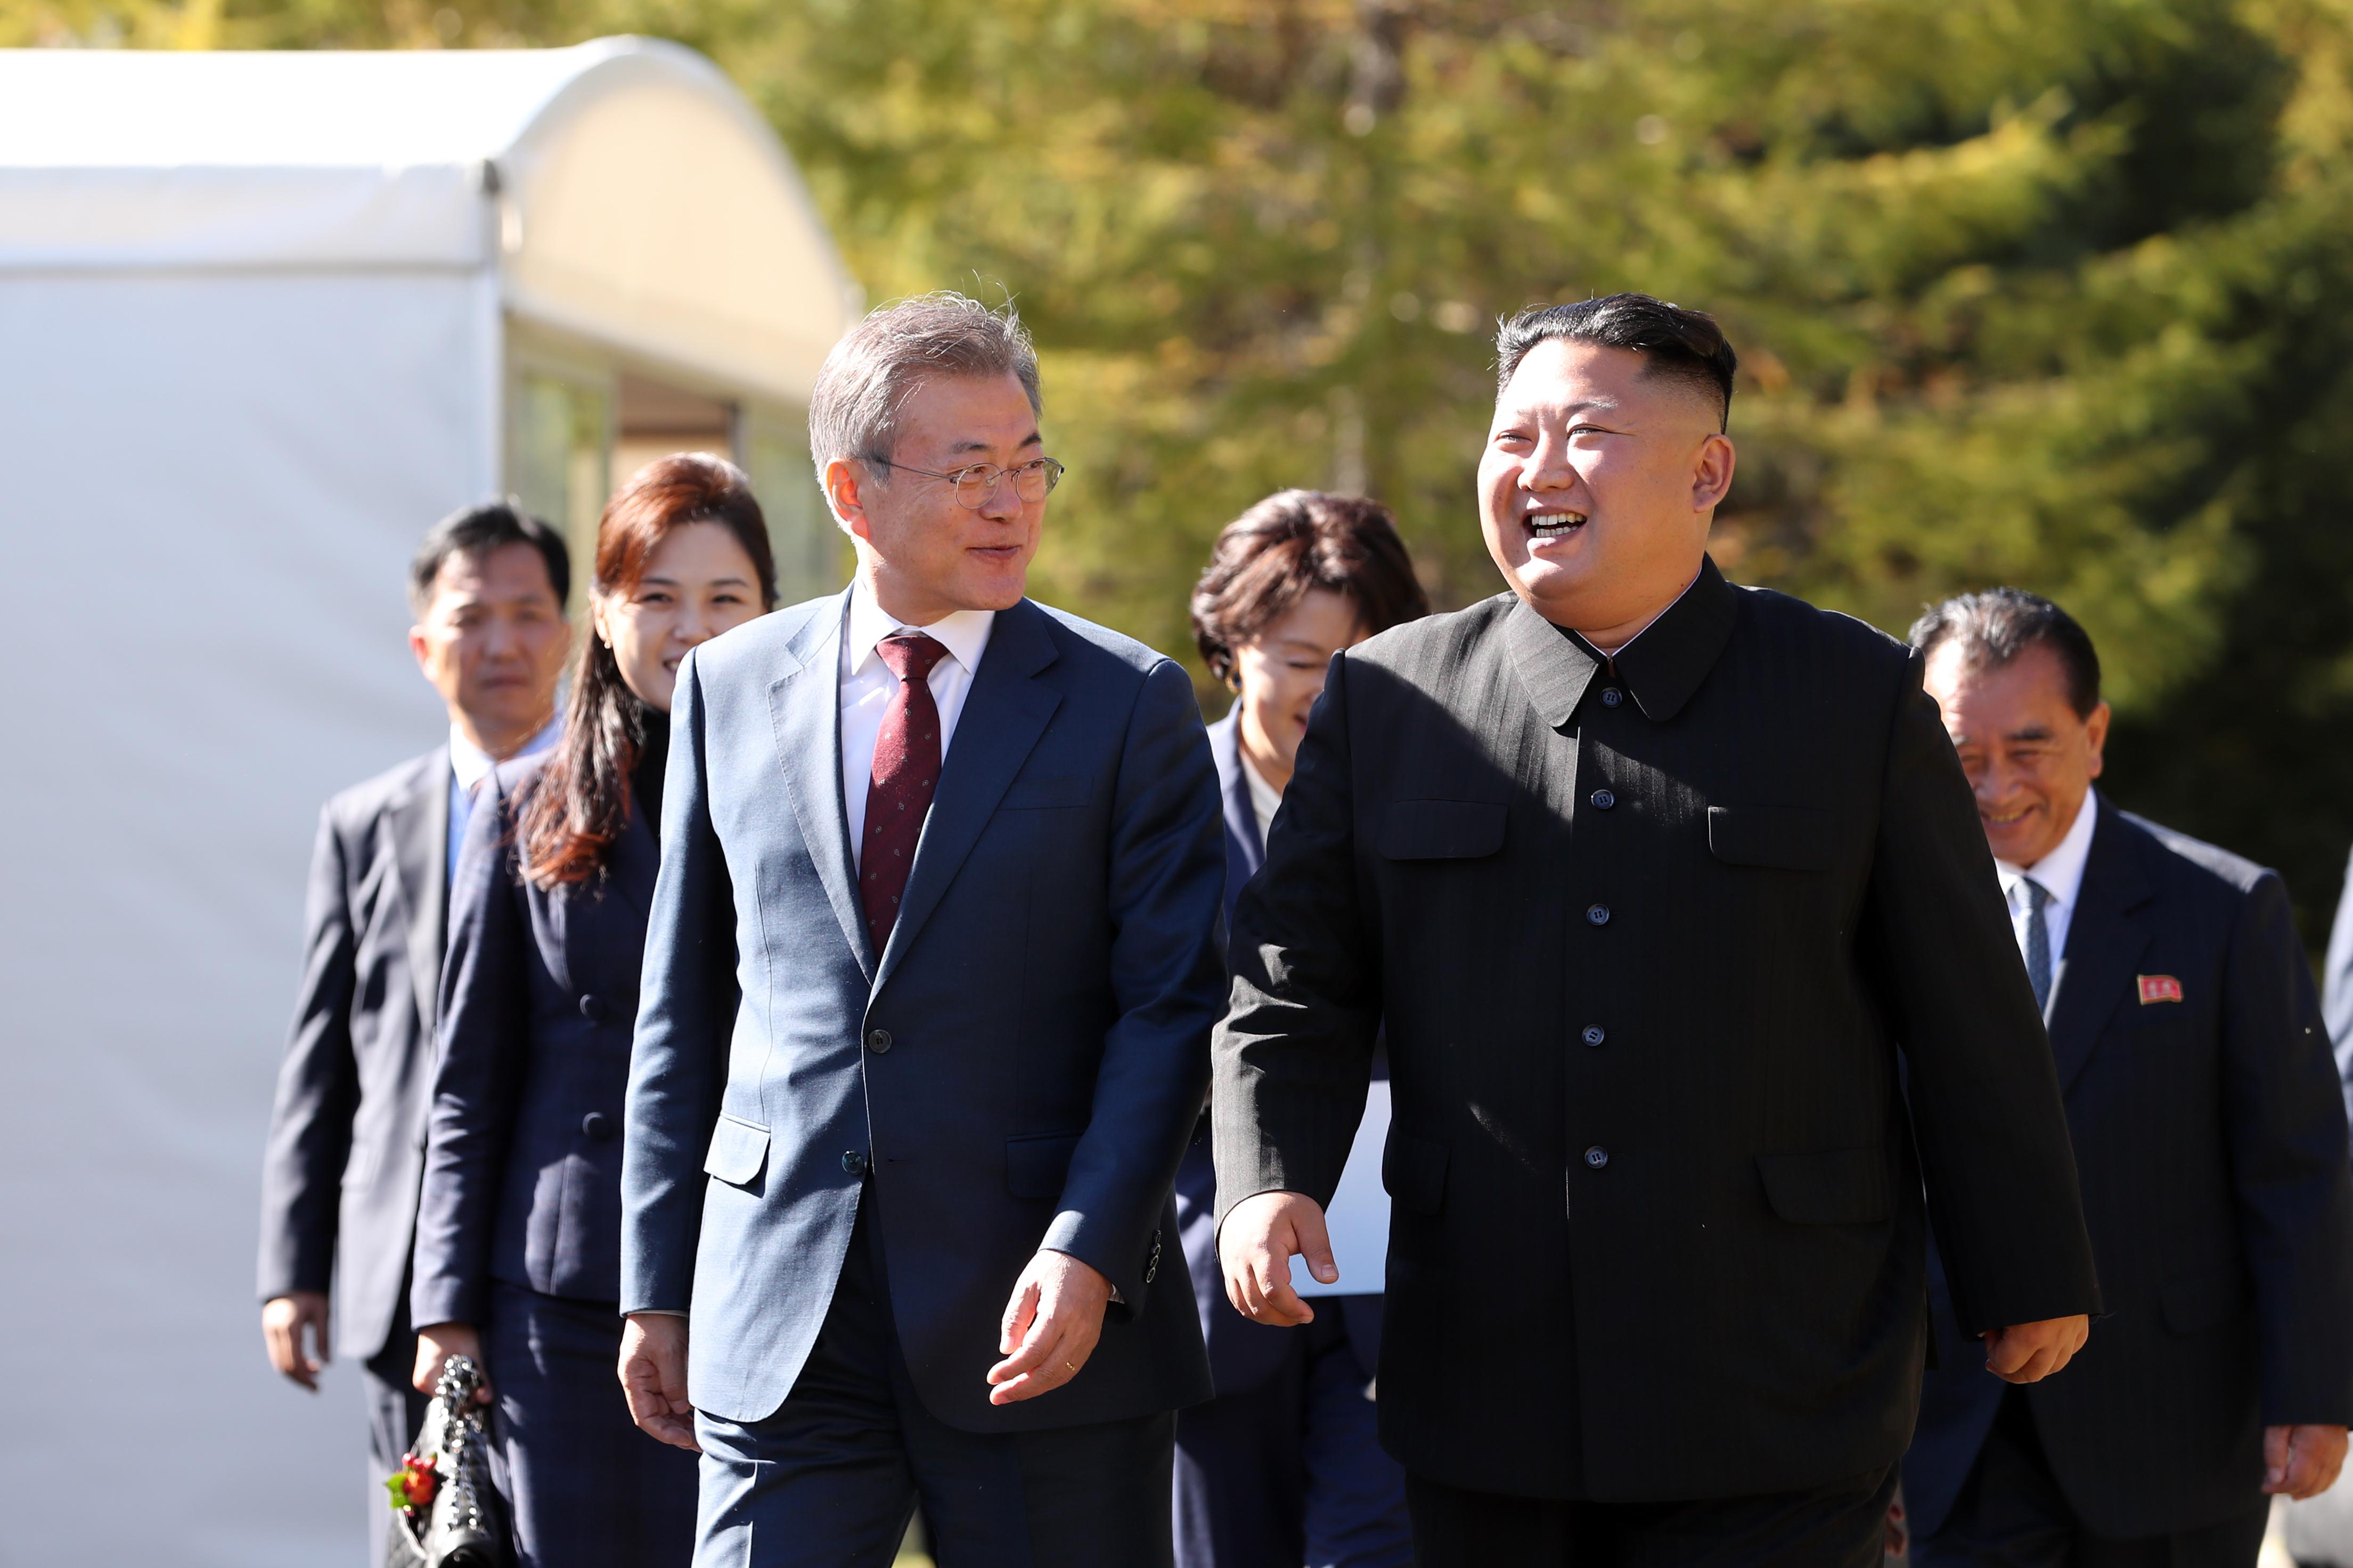 North Korean leader Kim Jong Un and South Korean President Moon Jae-in on September 20, 2018 in Samjiyon, North Korea.